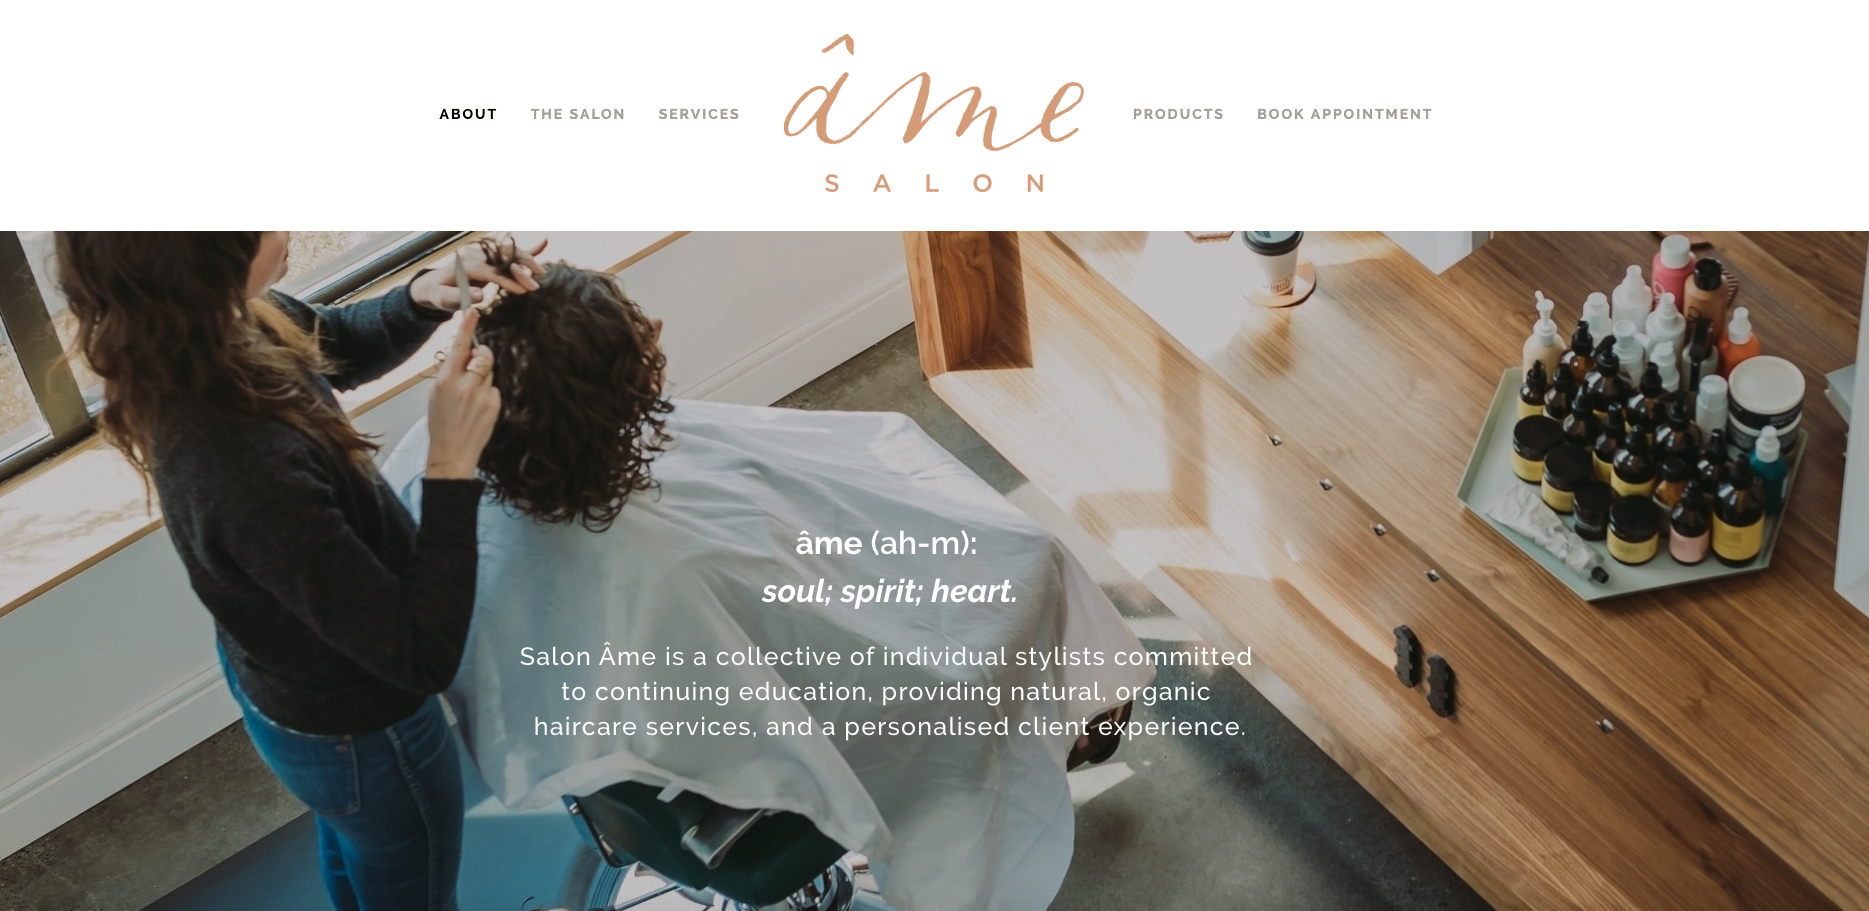 ÂME SALON website design - content curation - messaging - digital branding - SEO